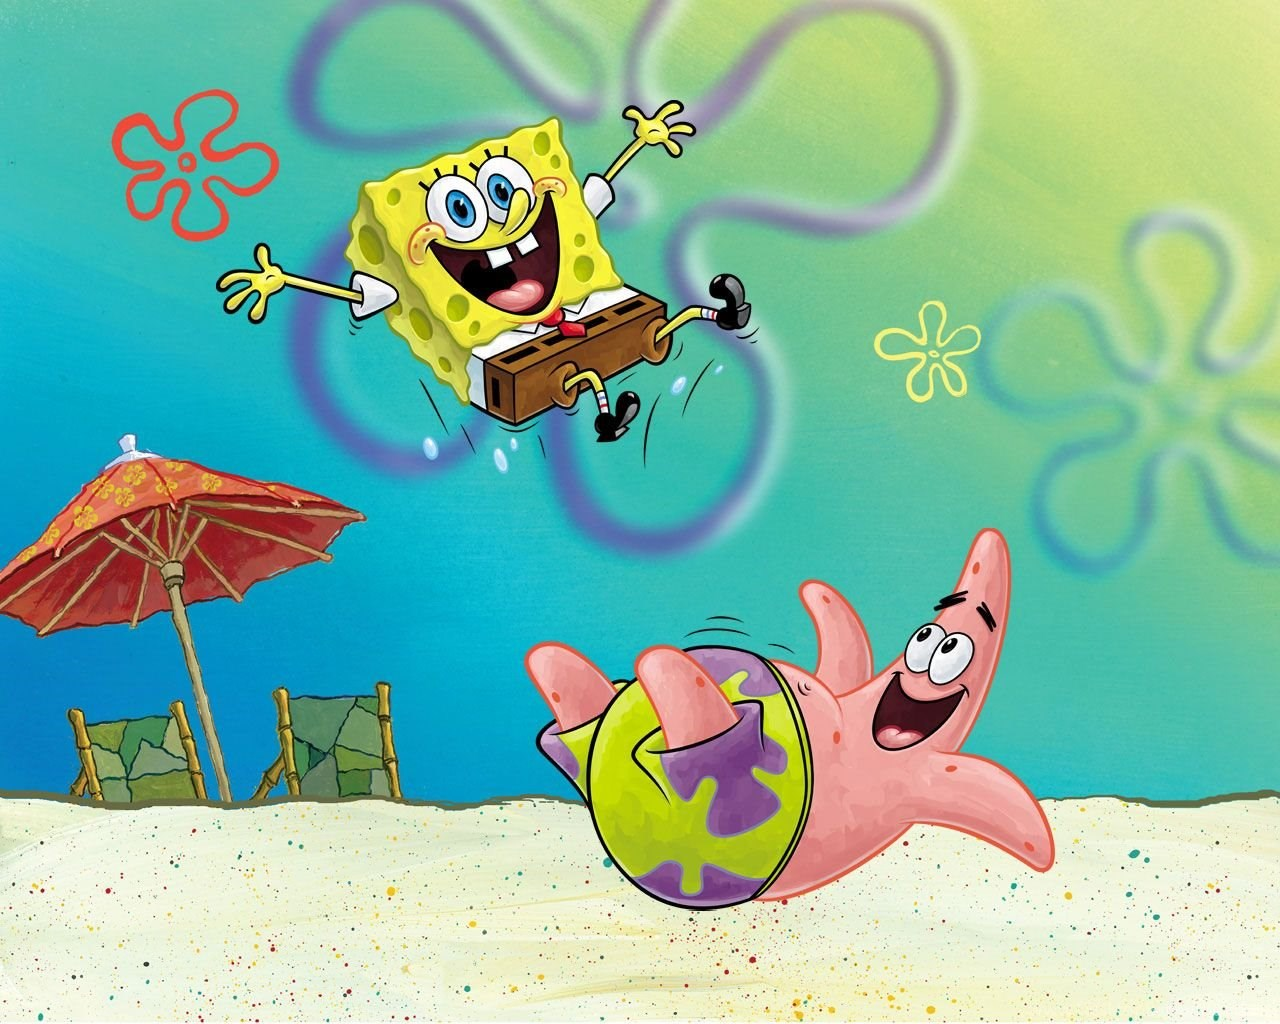 Spongebob Patrick Spongebob Squarepants Wallpapers 1280x1024